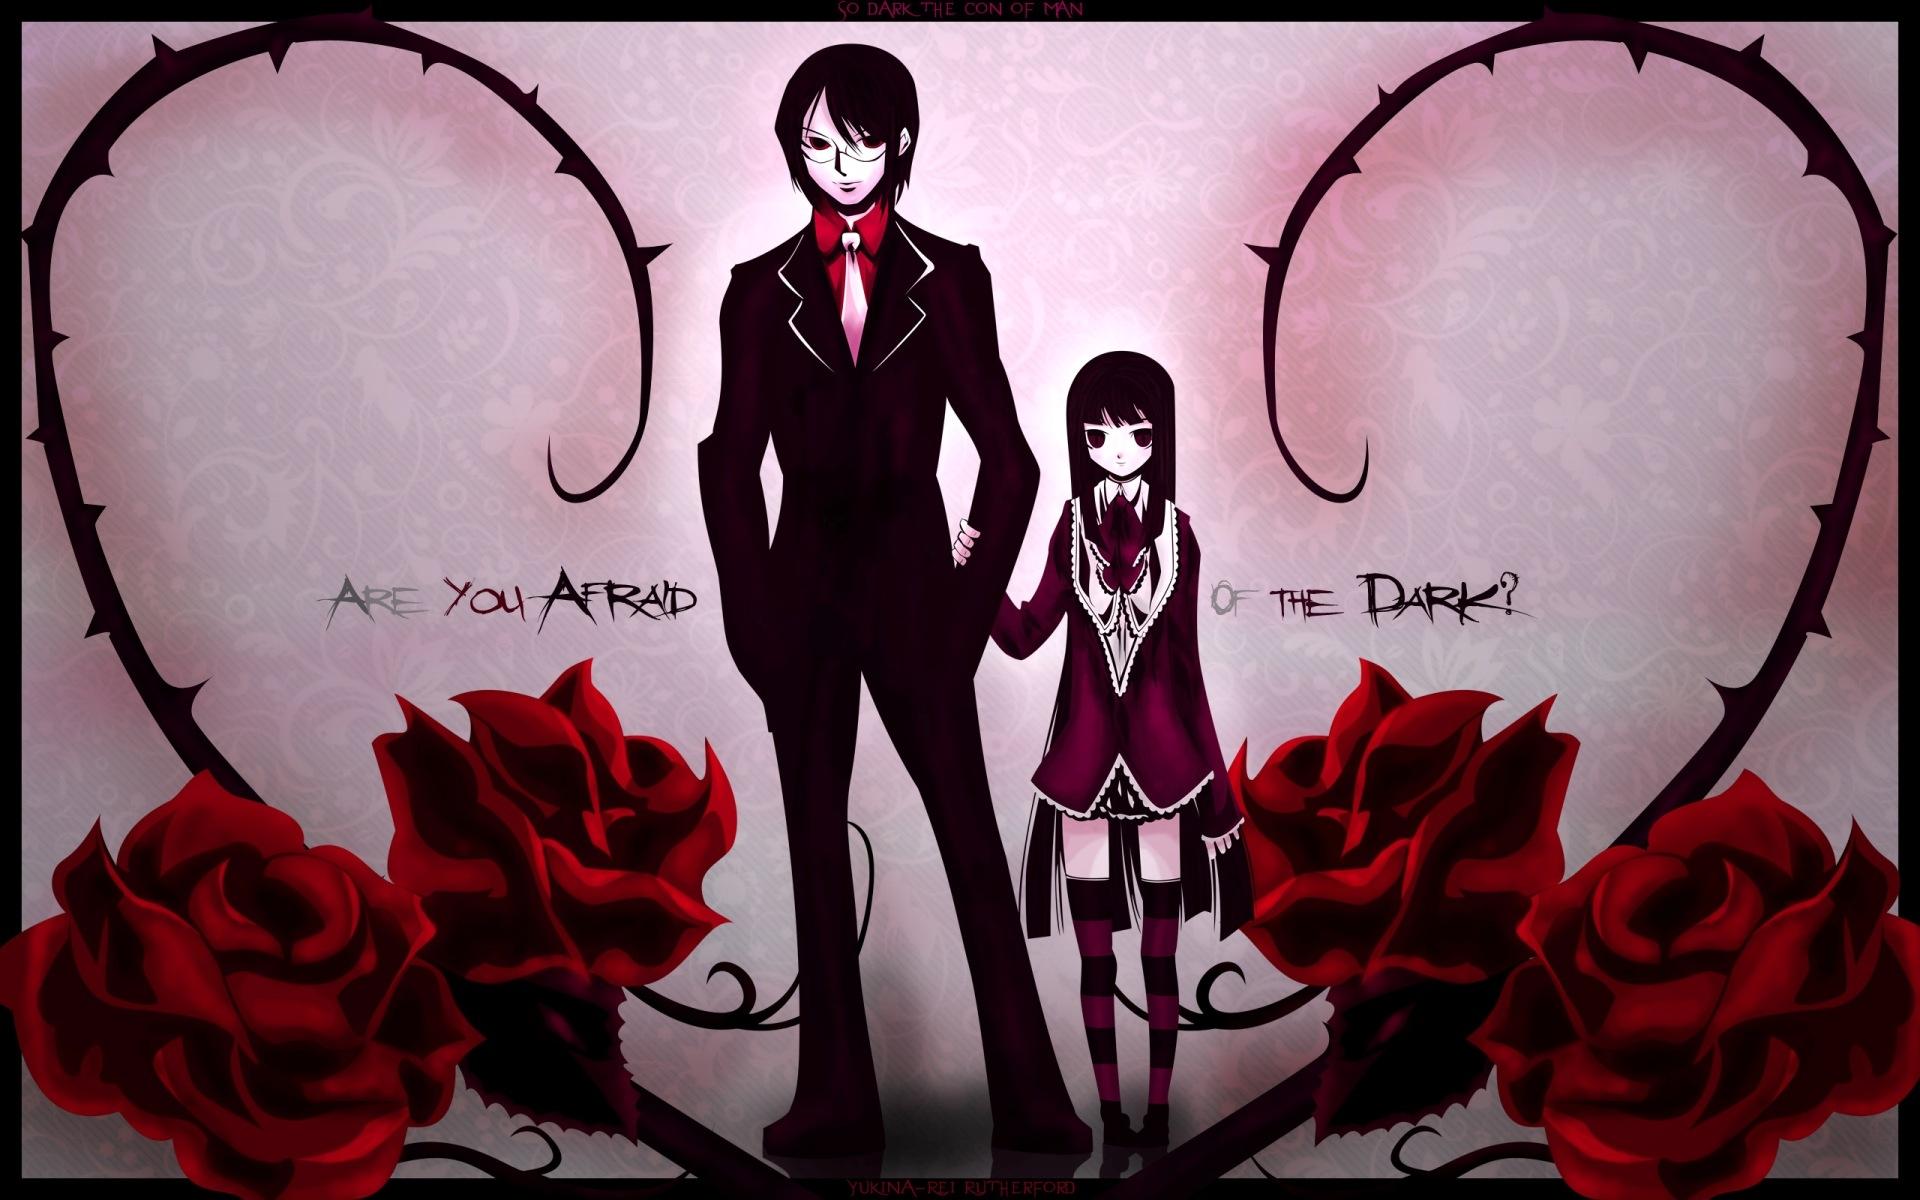 Wallpaper boy dark anime girl rose background - Boy with rose wallpaper ...